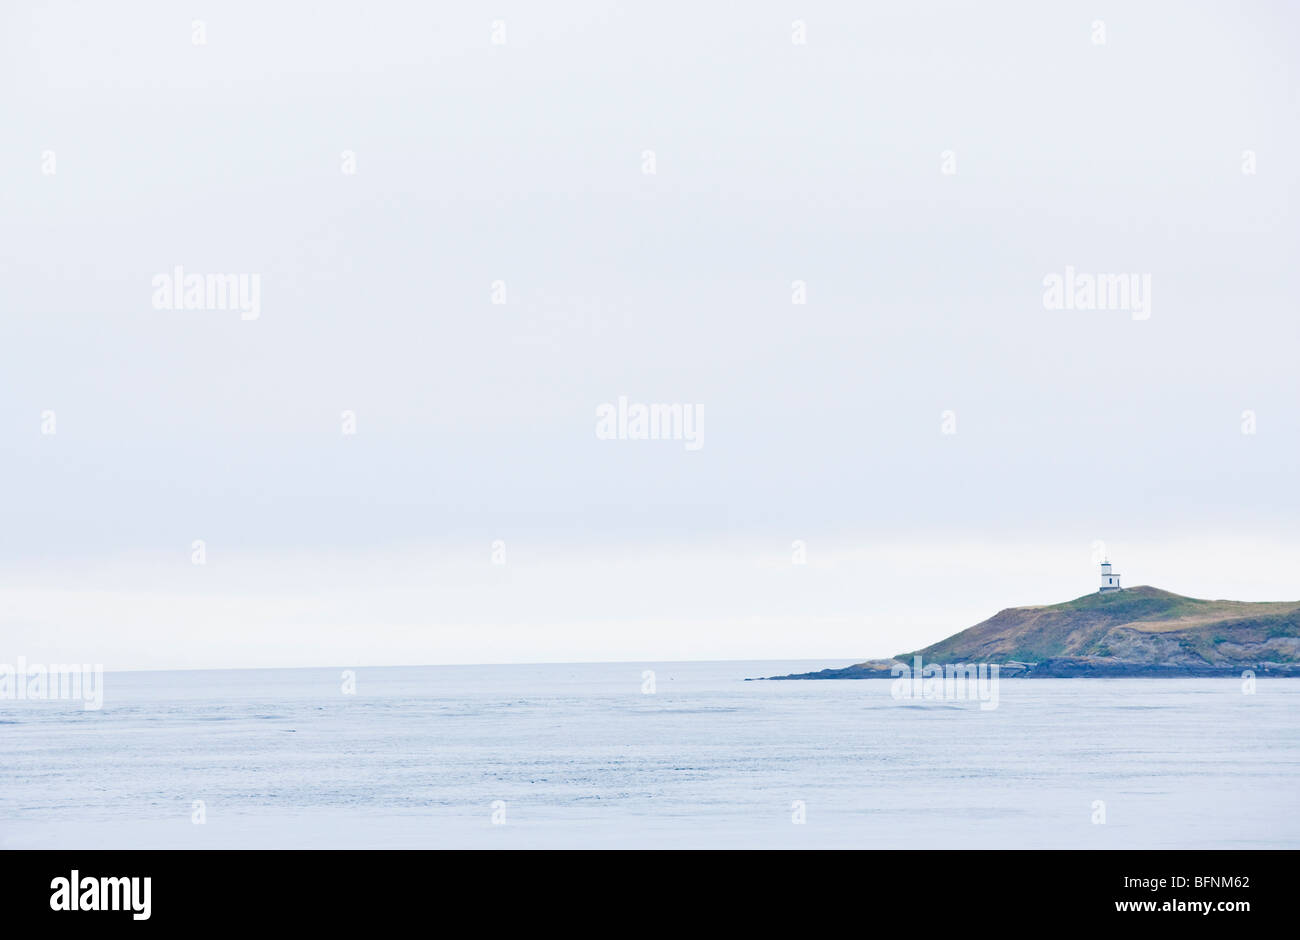 The Lighthouse Reservation on San Juan Island in the San Juan Island National Historical Park - Stock Image